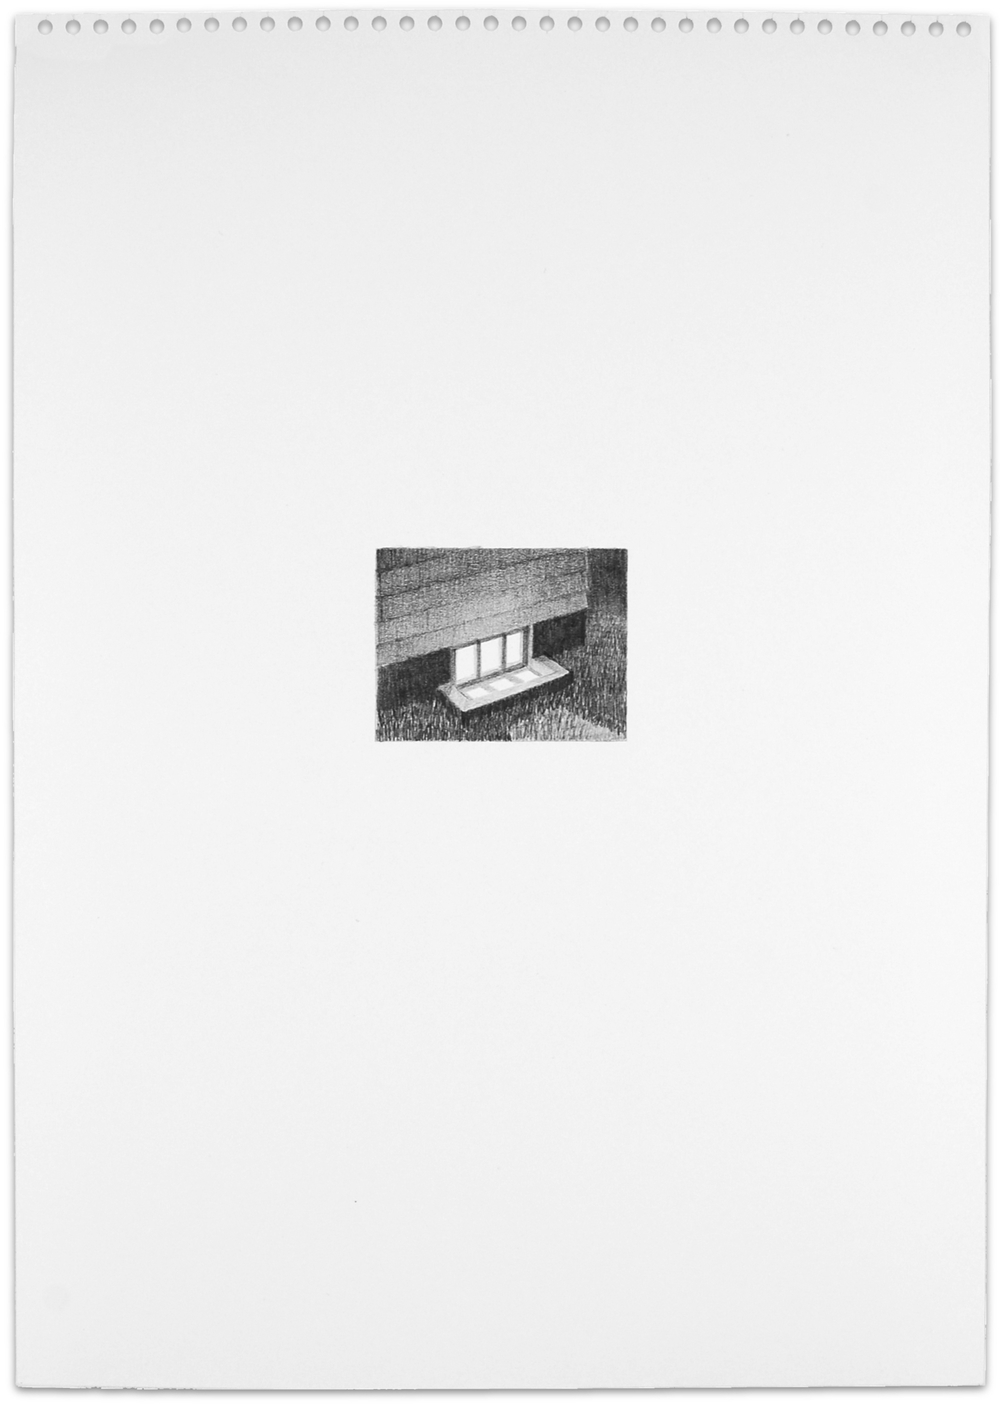 Secret (basement), 2013, 16.5 x 11.5, graphite on paper